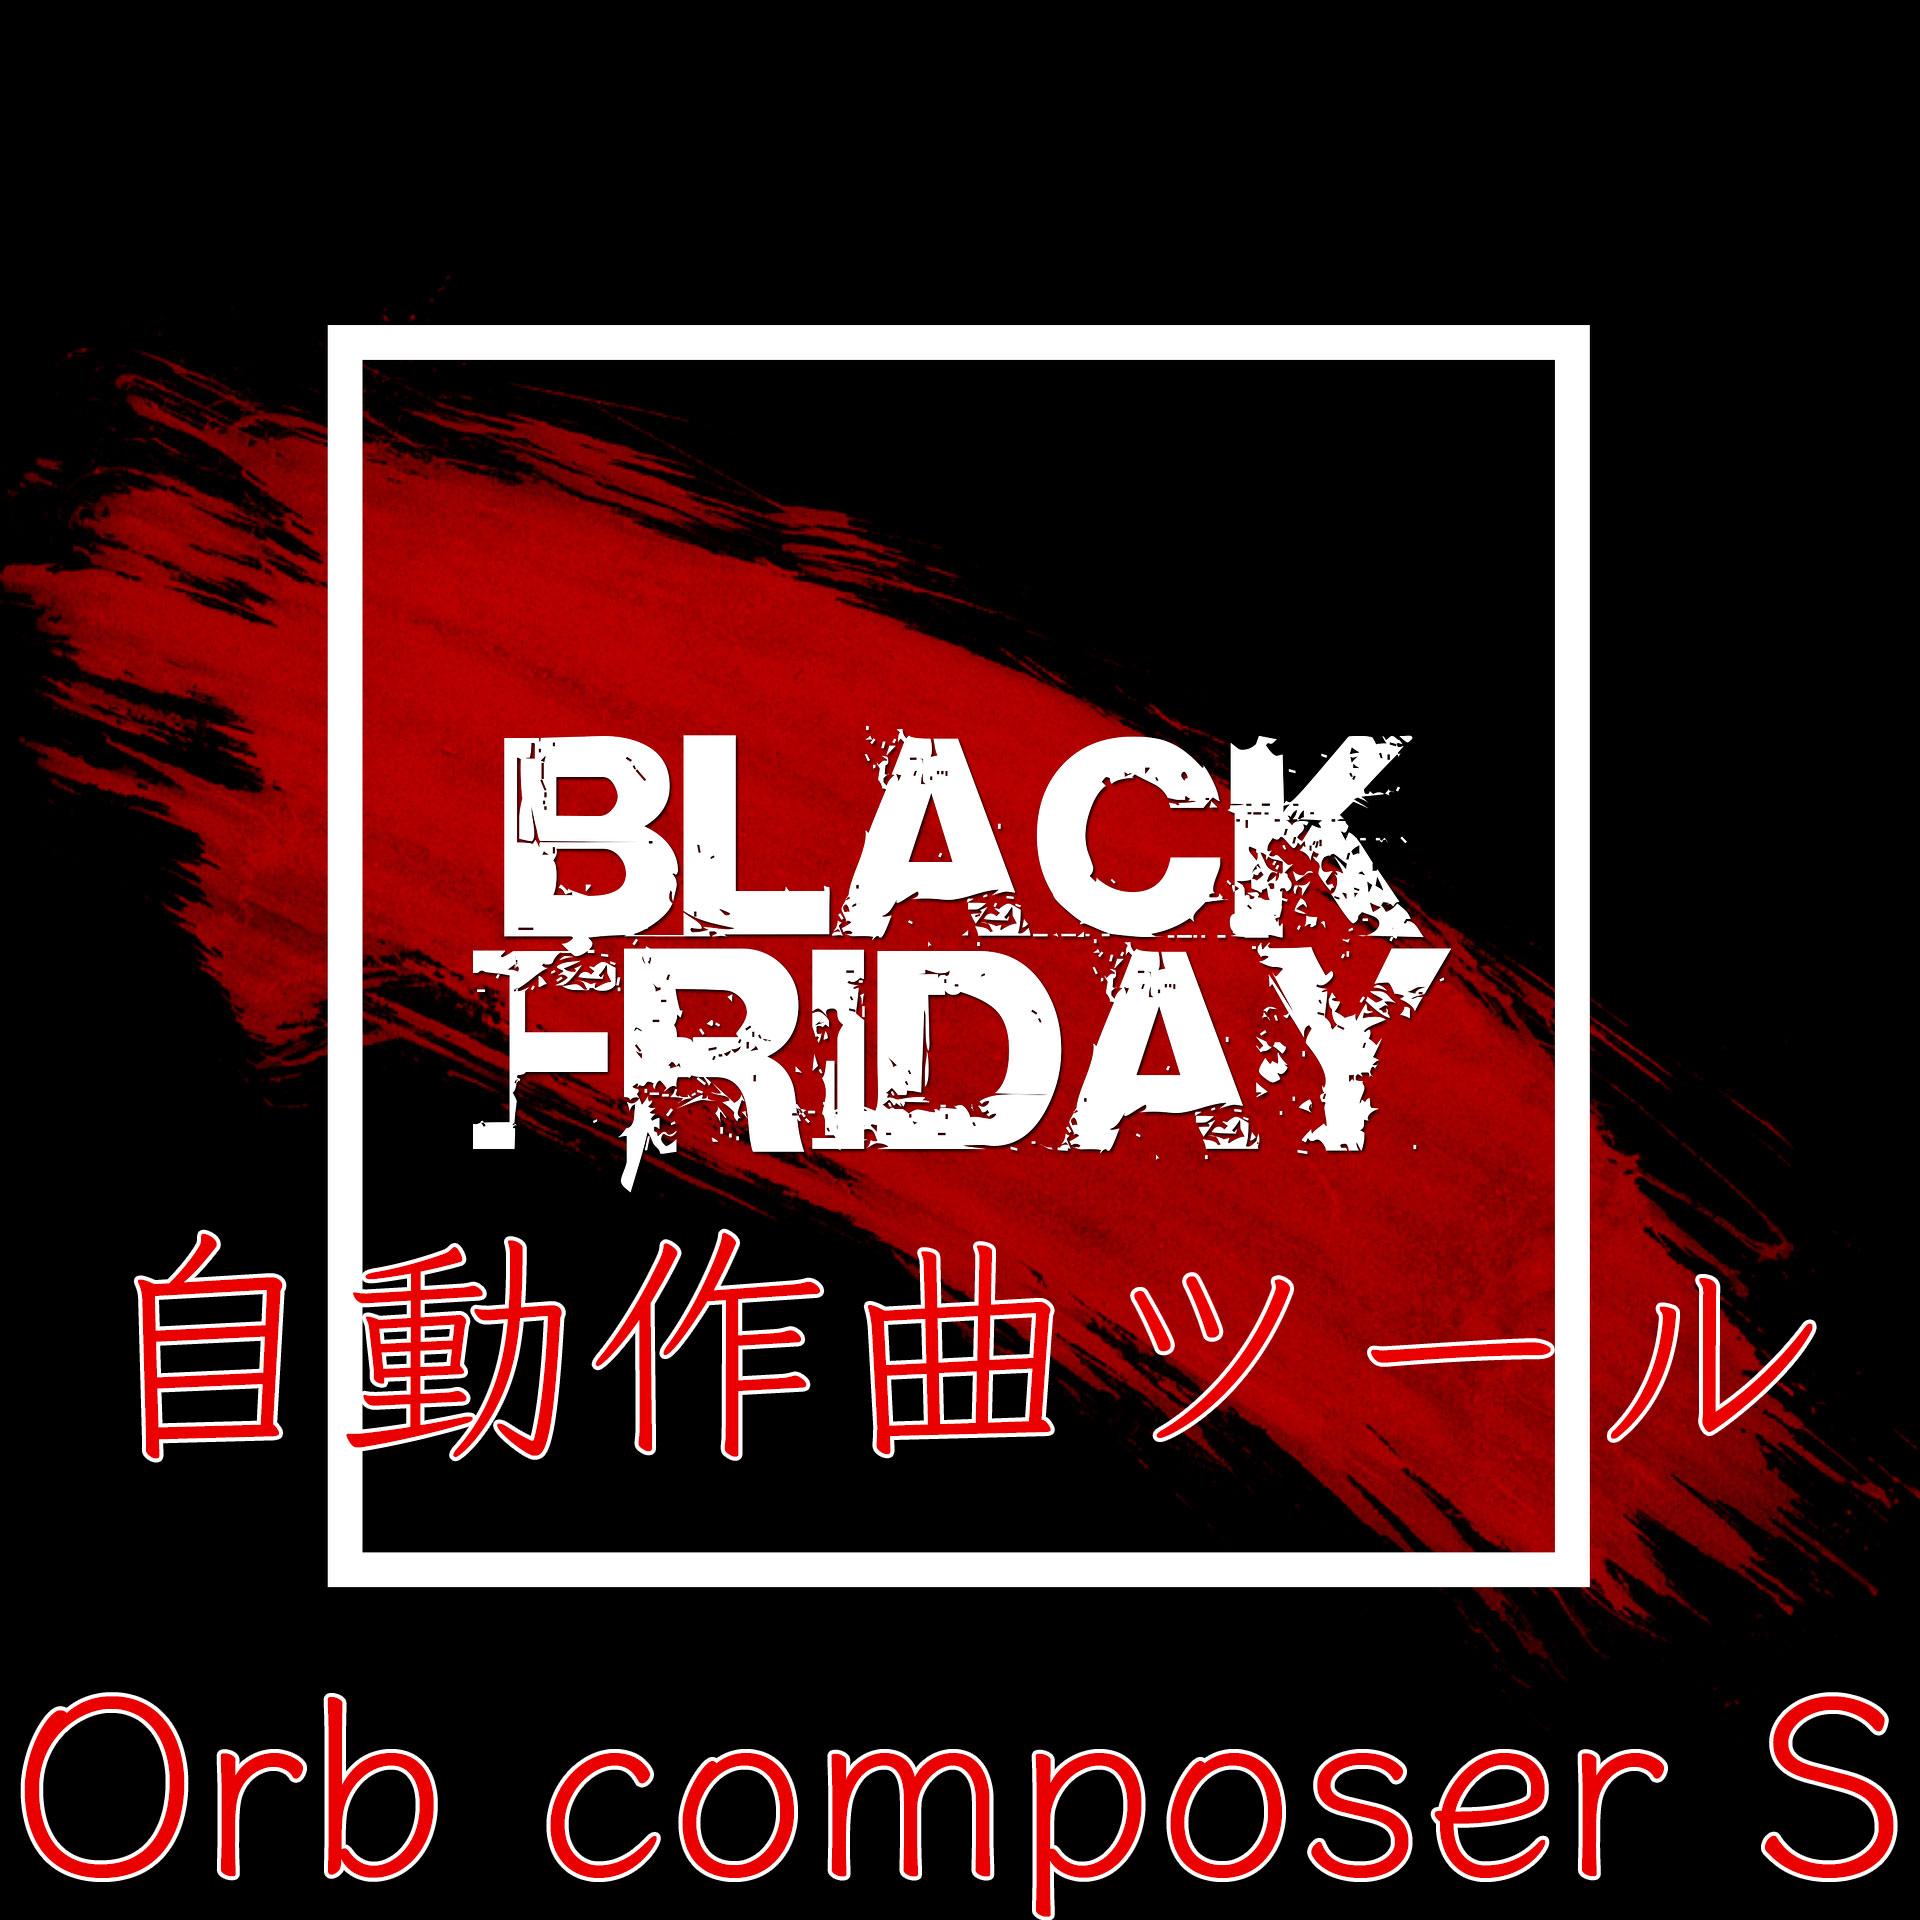 Orb composerがセール中